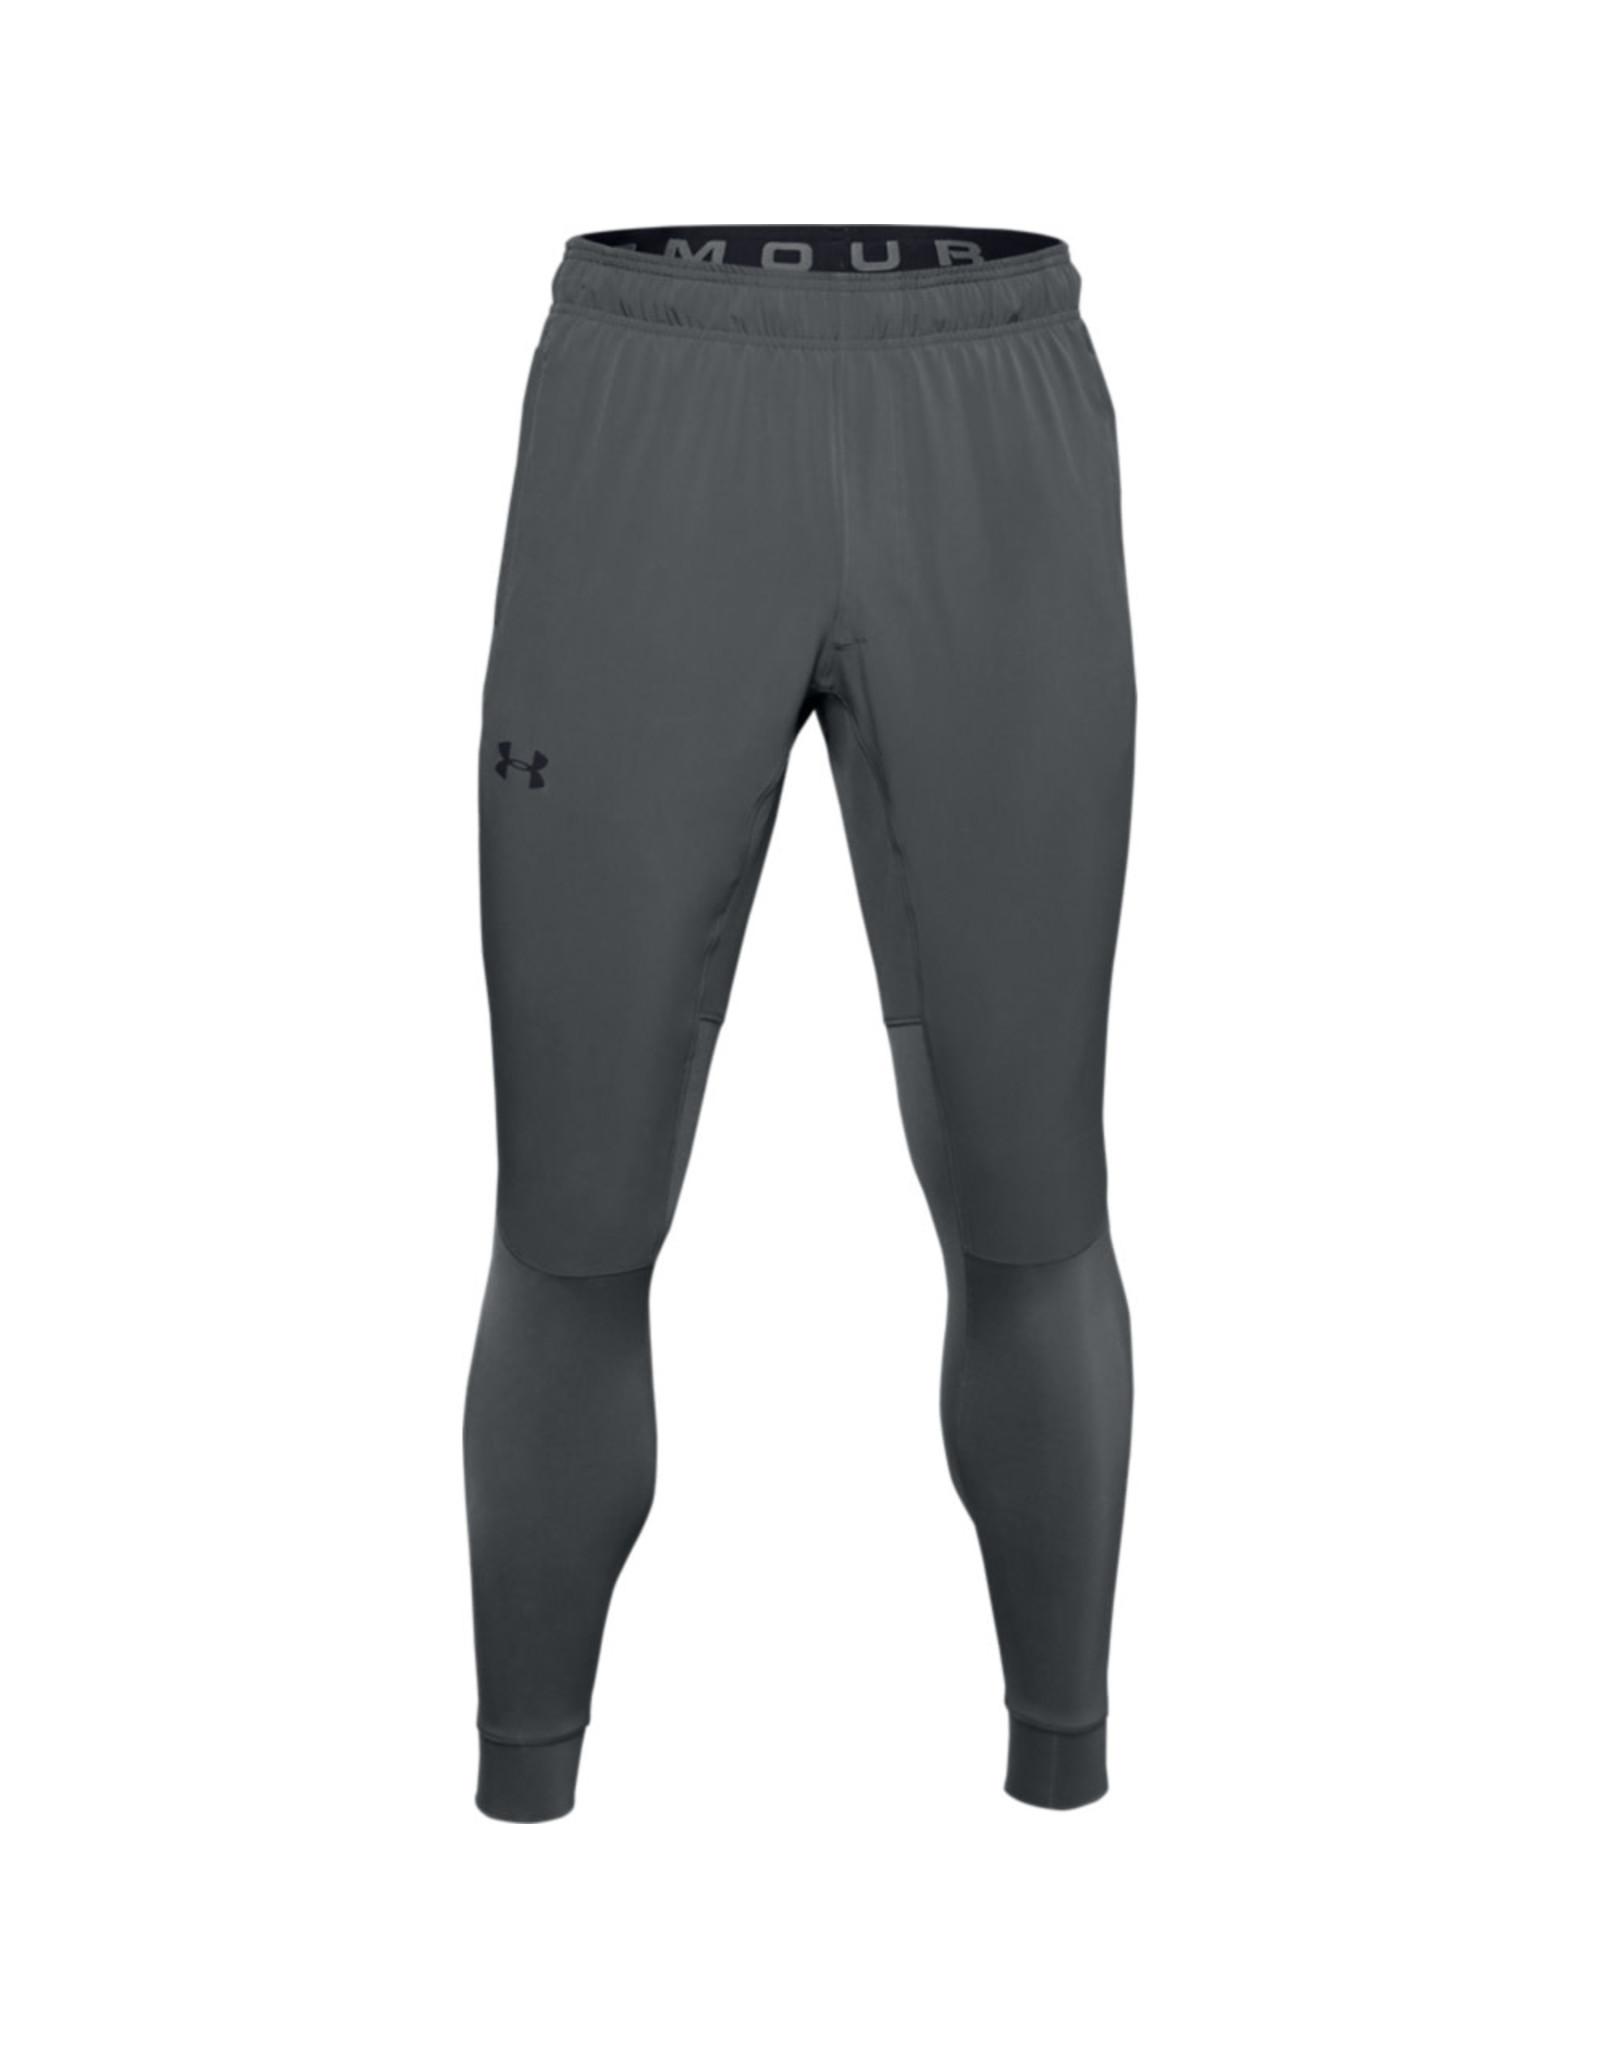 Under Armour Hybrid pants - grey